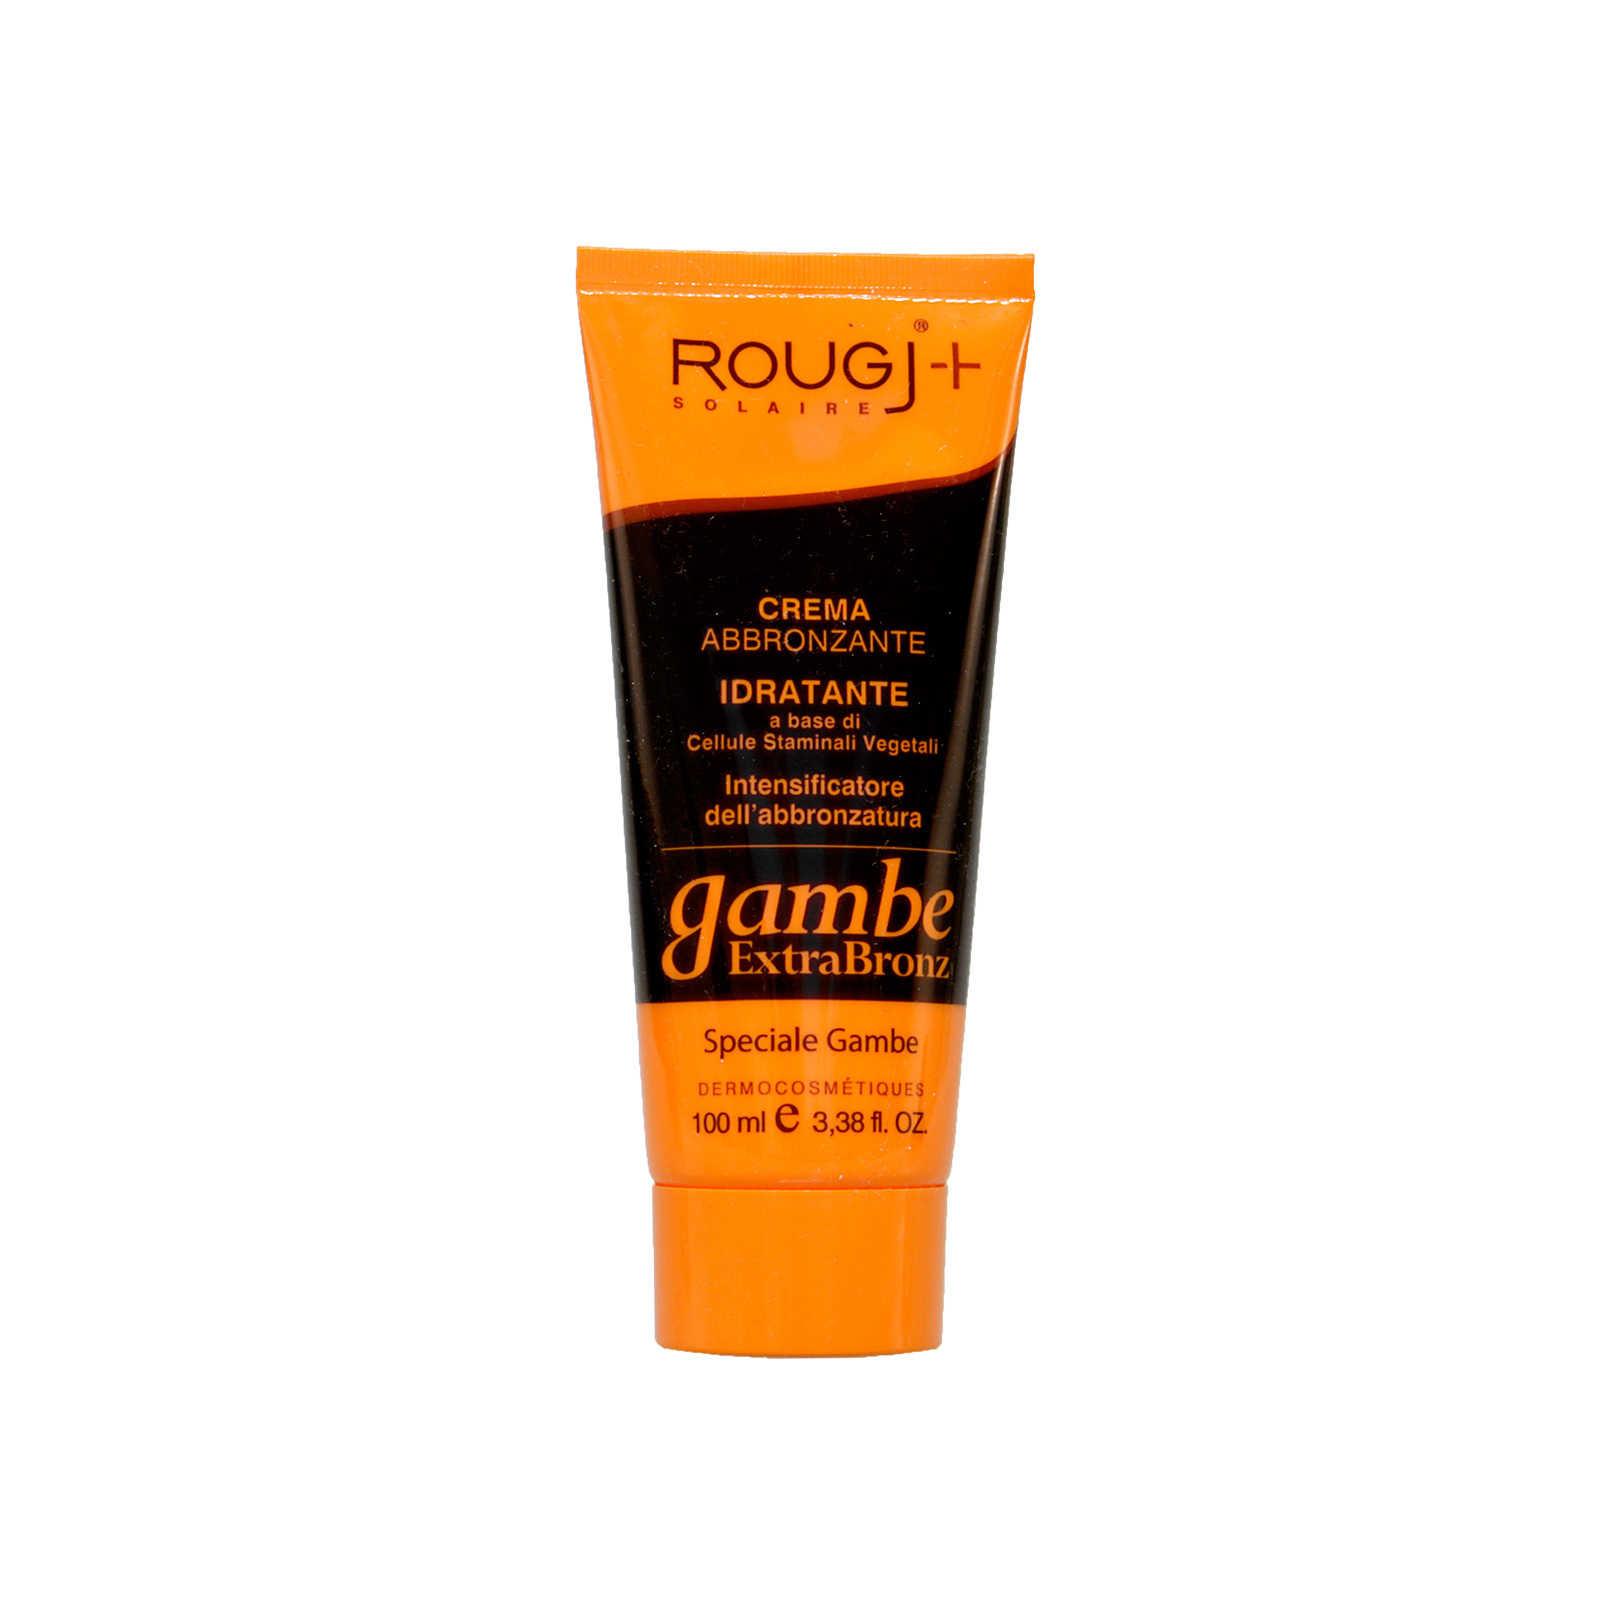 Rougj - Crema Abbranzante - Extrabronz - Gambe